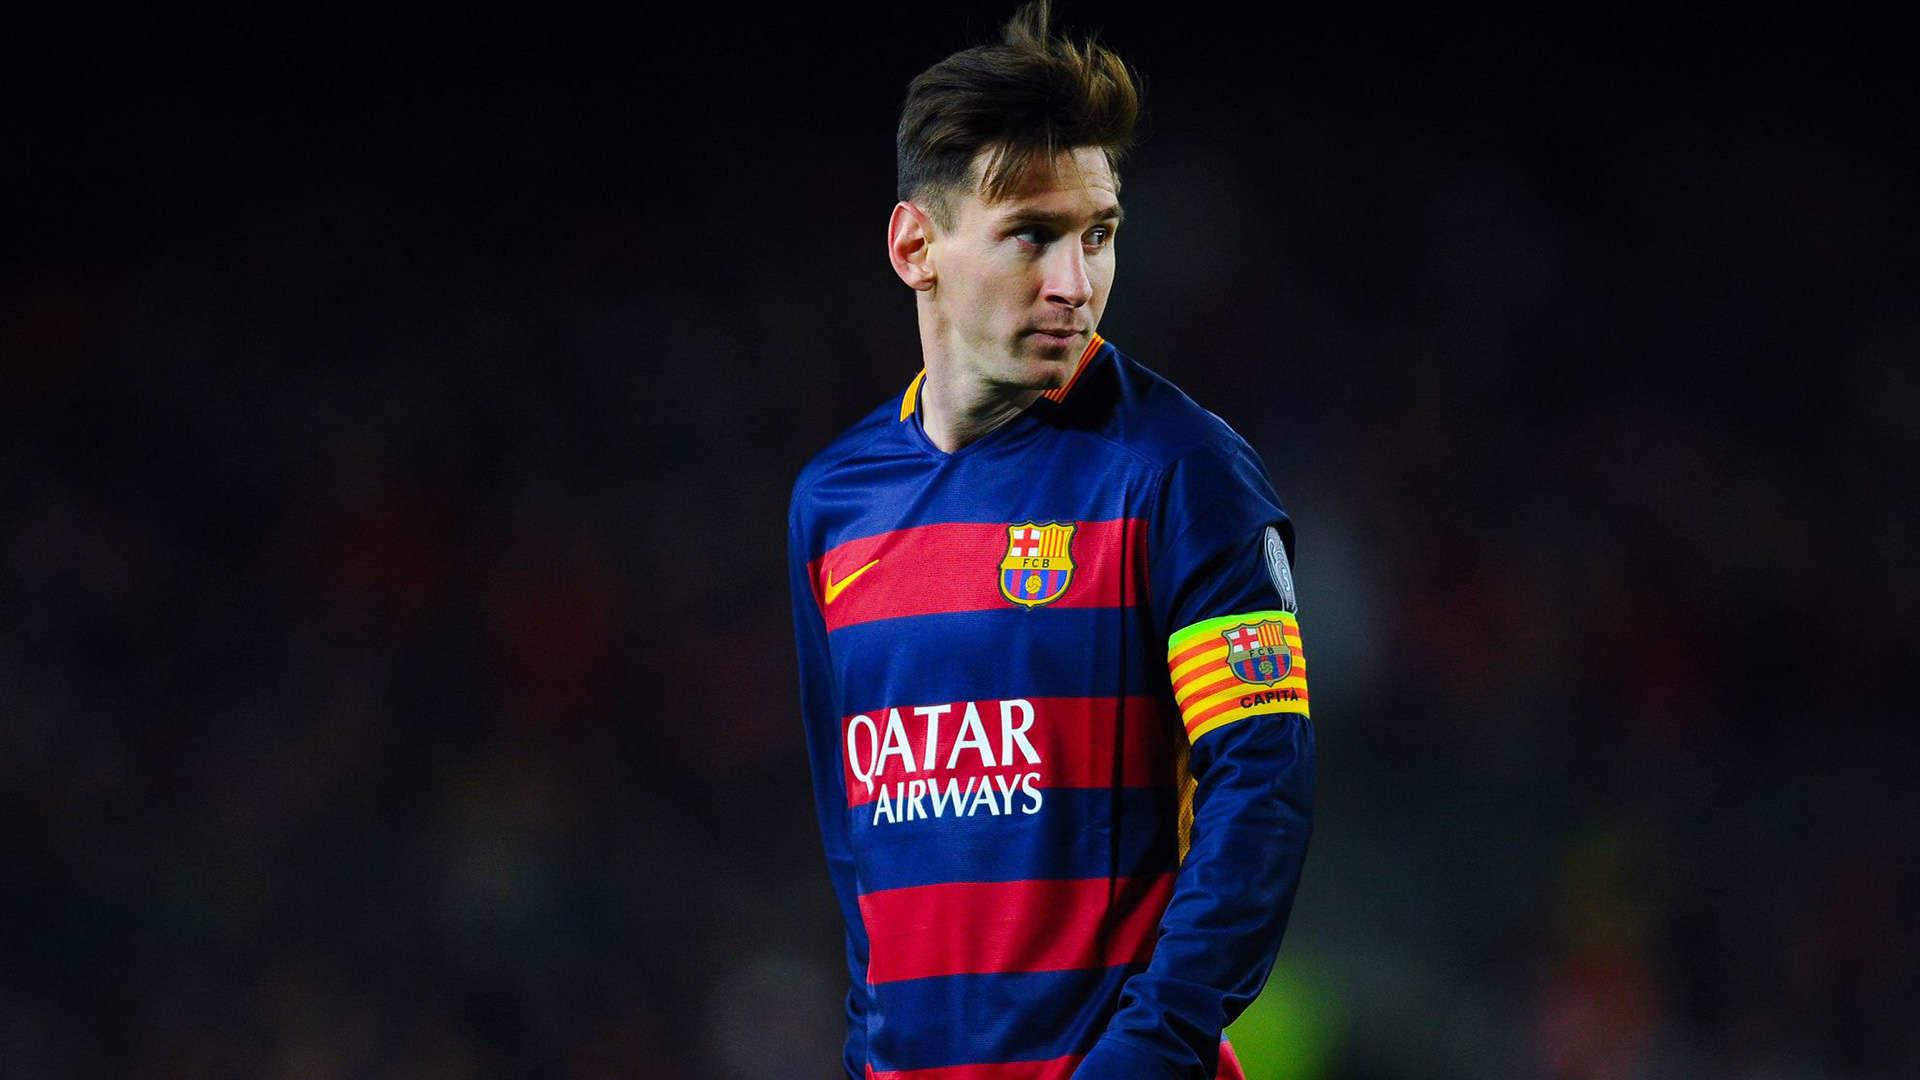 Messi Vs Ronaldo Wallpaper HD 2017